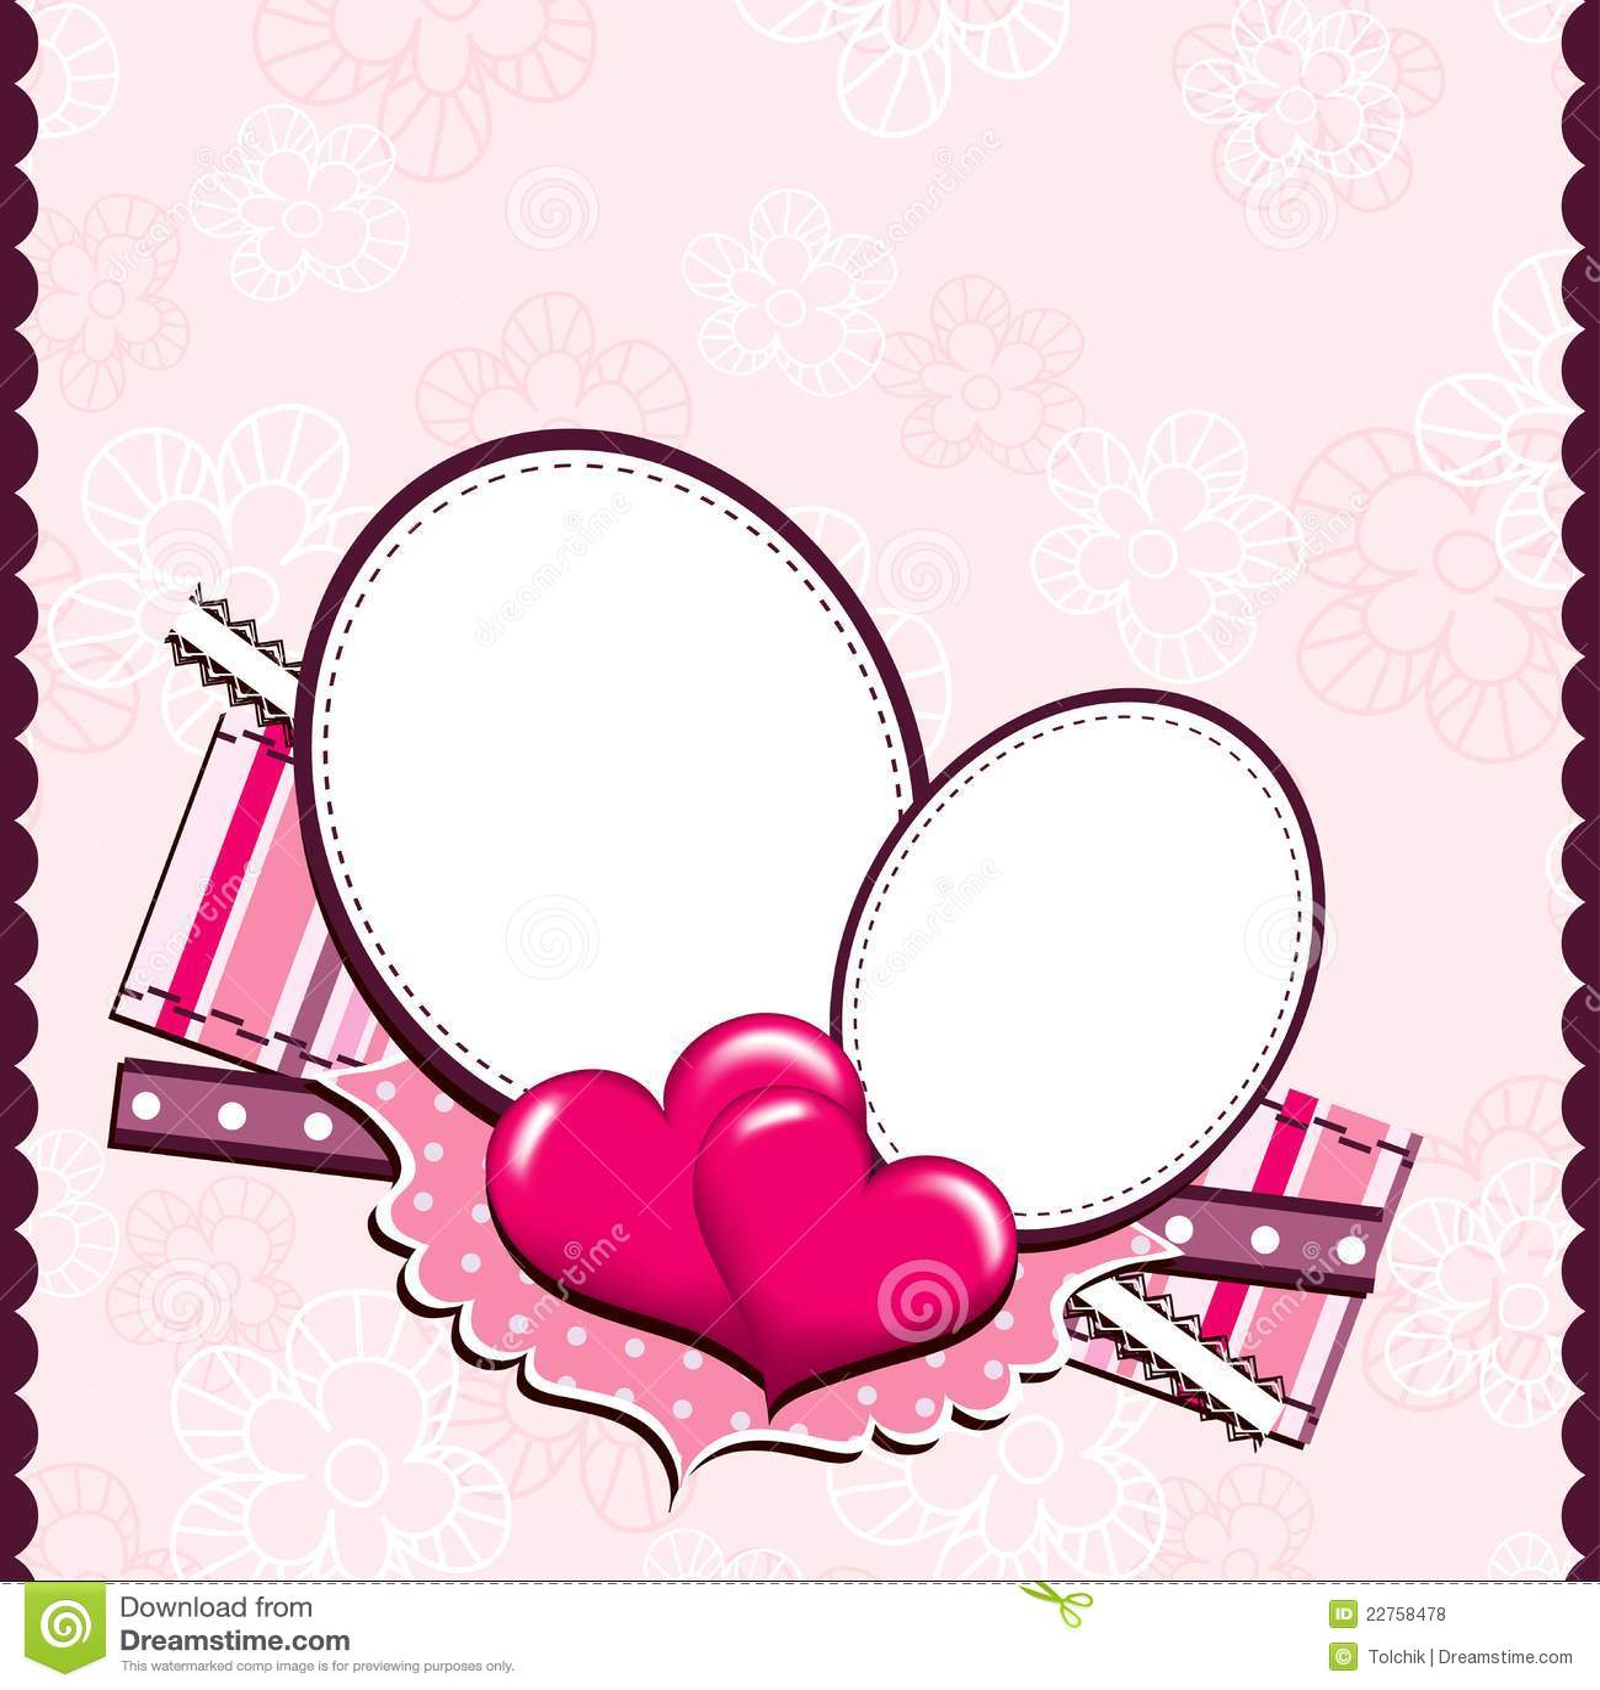 Heart Card Template Template heart greeting card,